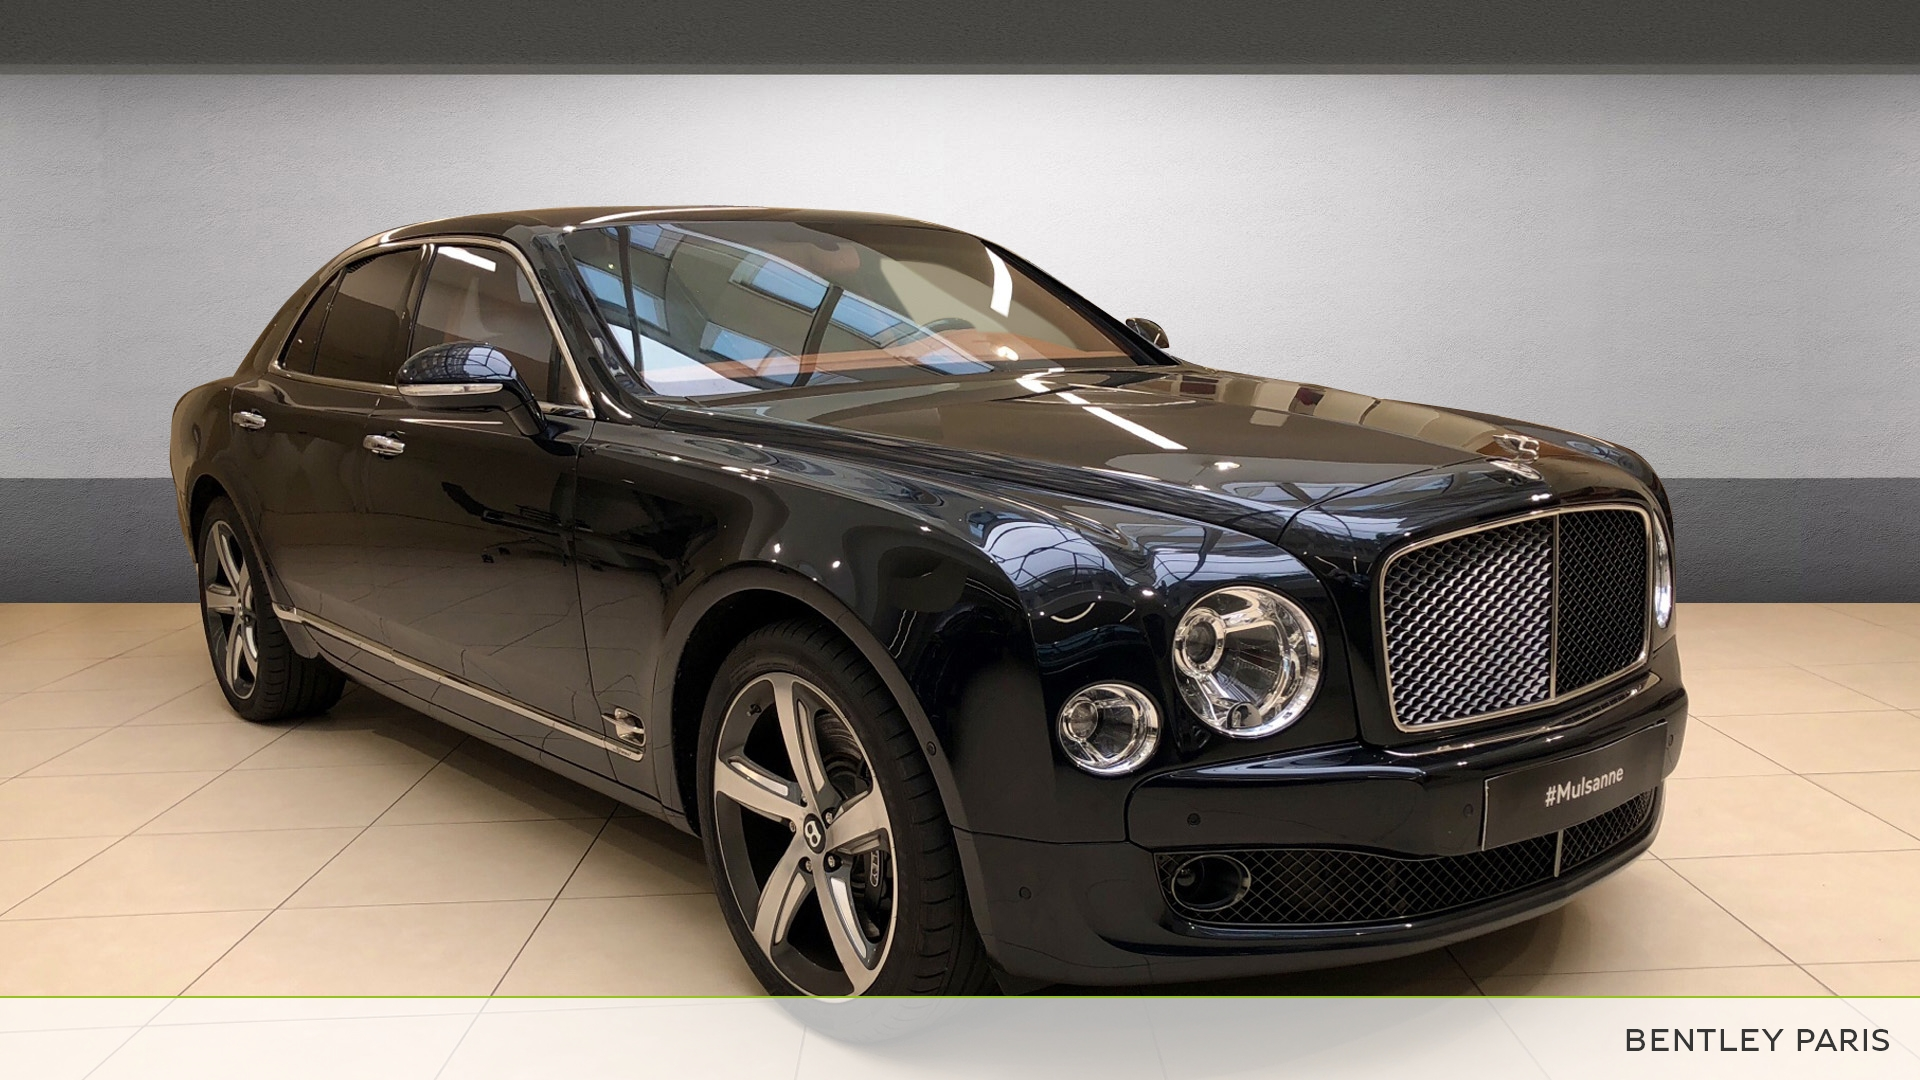 bentley mulsanne speed used car for sale in paris. Black Bedroom Furniture Sets. Home Design Ideas